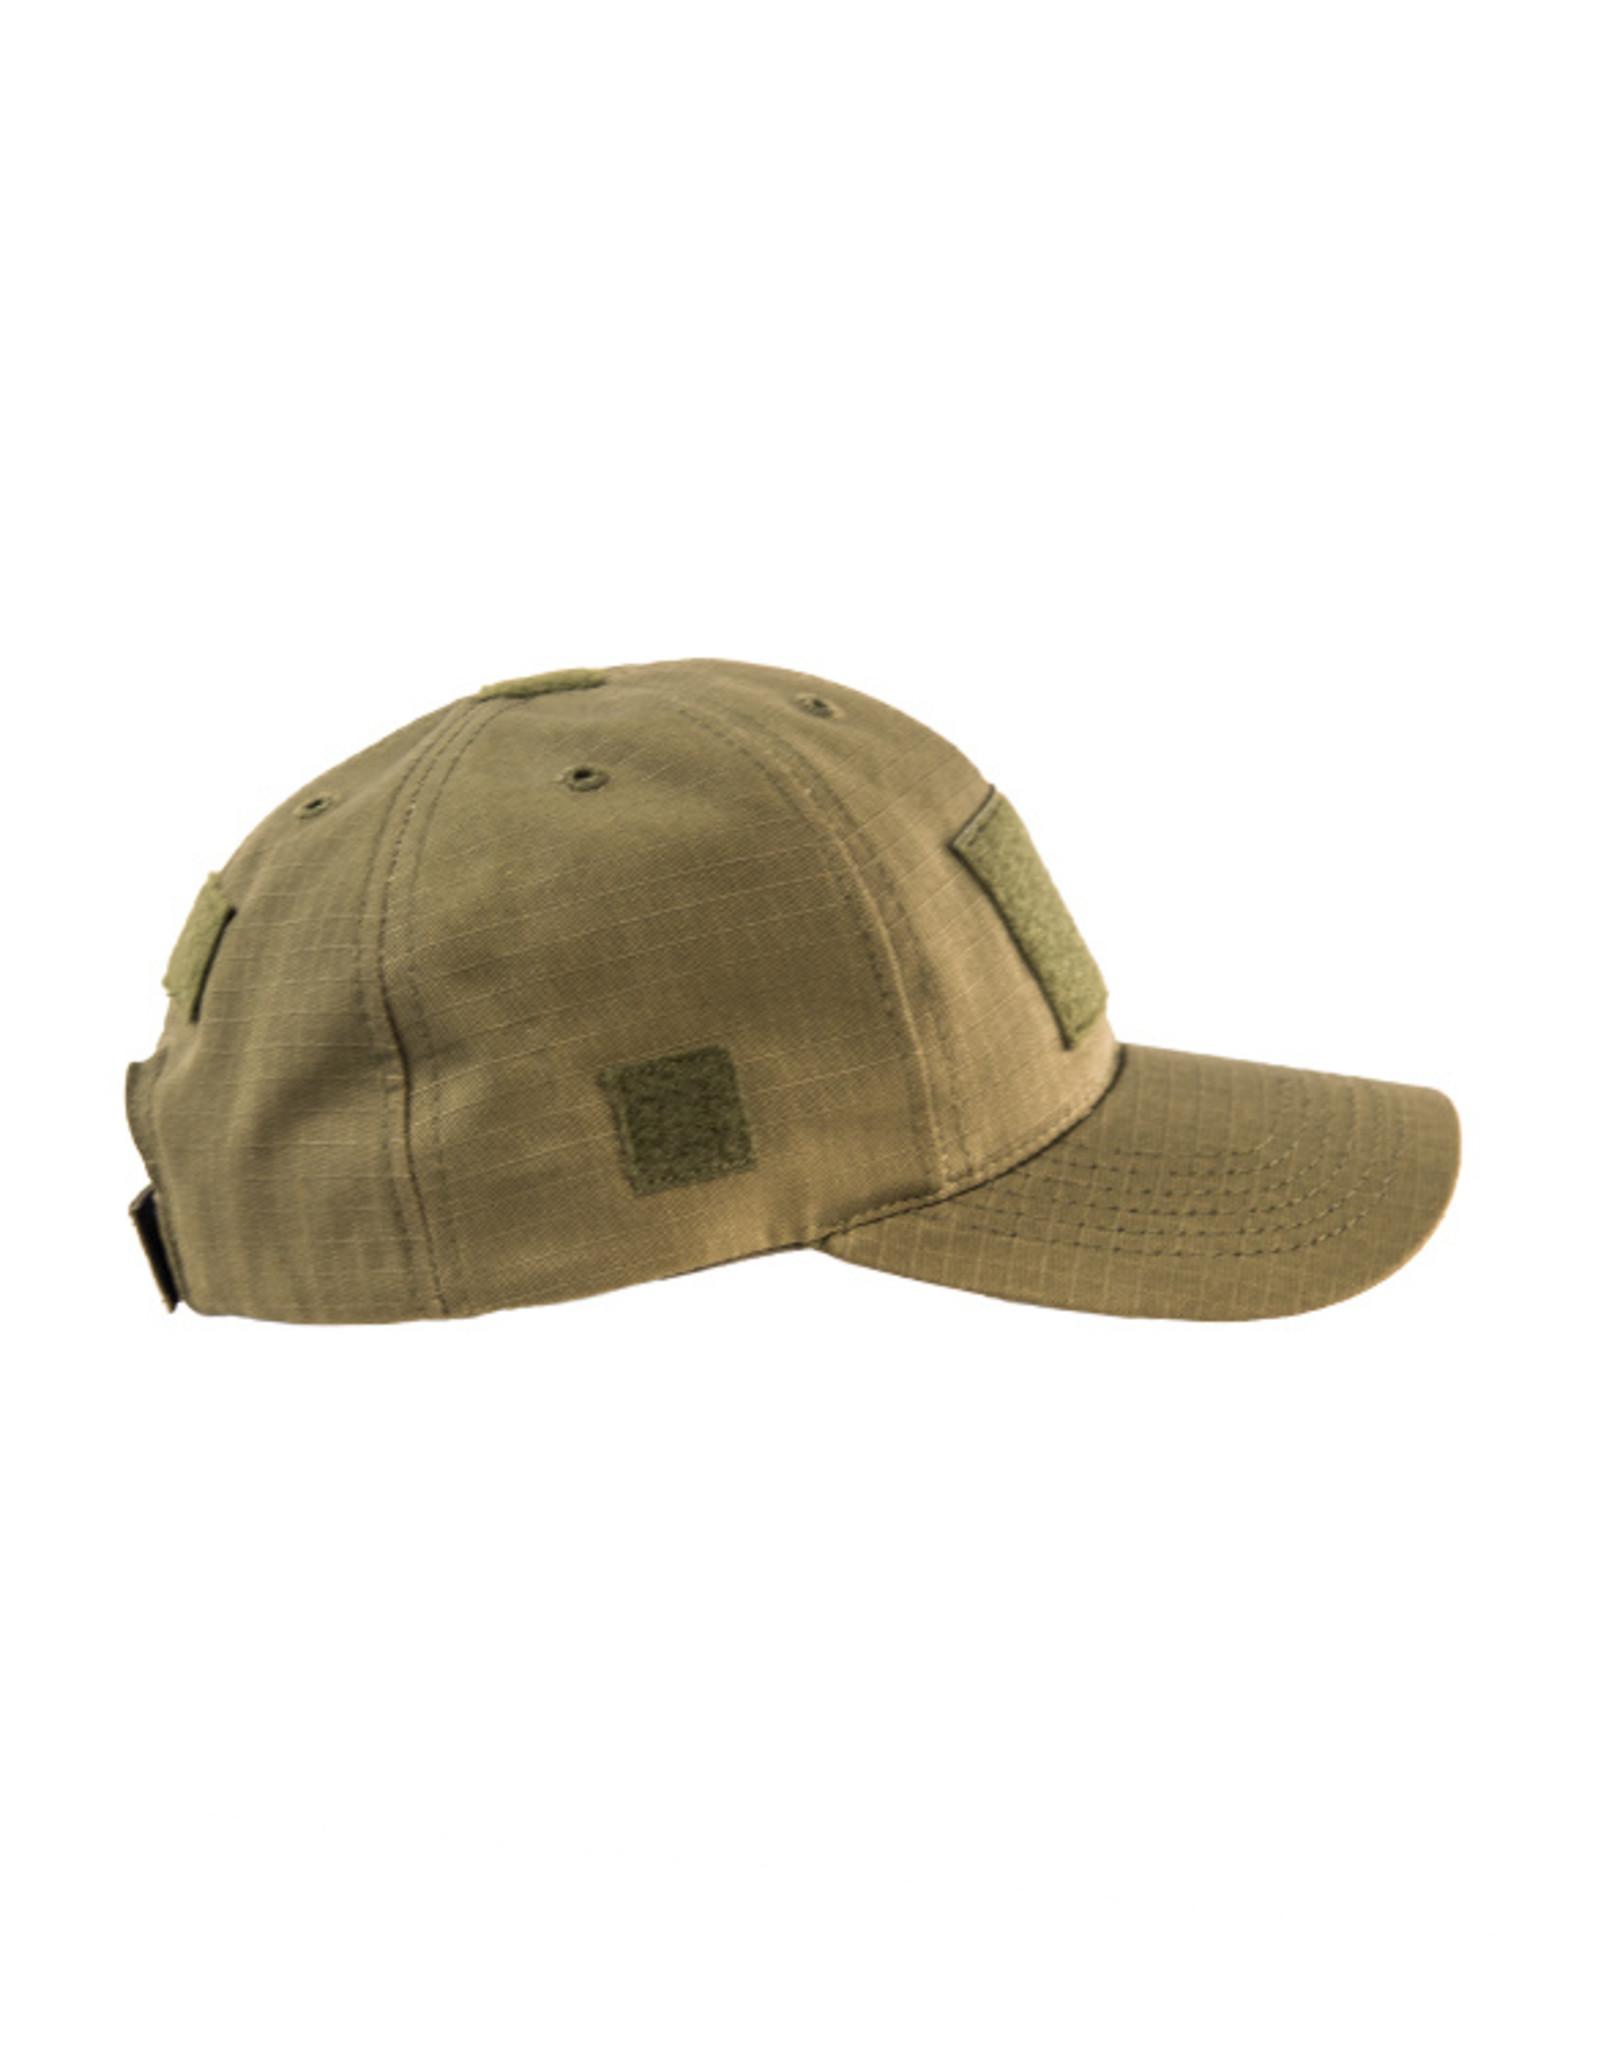 HIGH SPEED GEAR HIGH SPEED GEAR (HSGI) BASEBALL CAP - STERILE